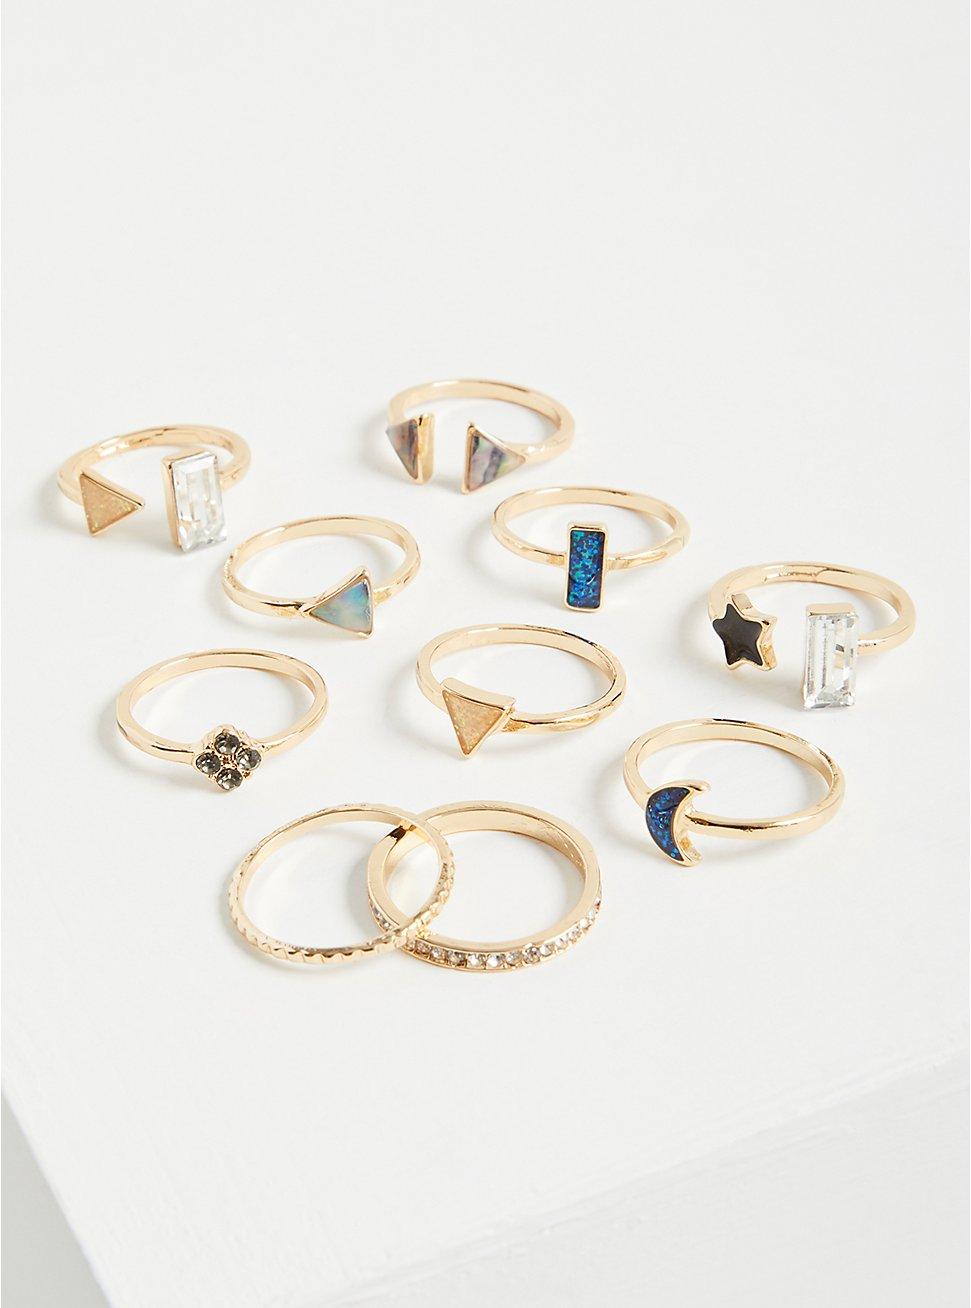 Plus Size Celestial Ring Set of 10 - Gold Tone , MULTI, hi-res